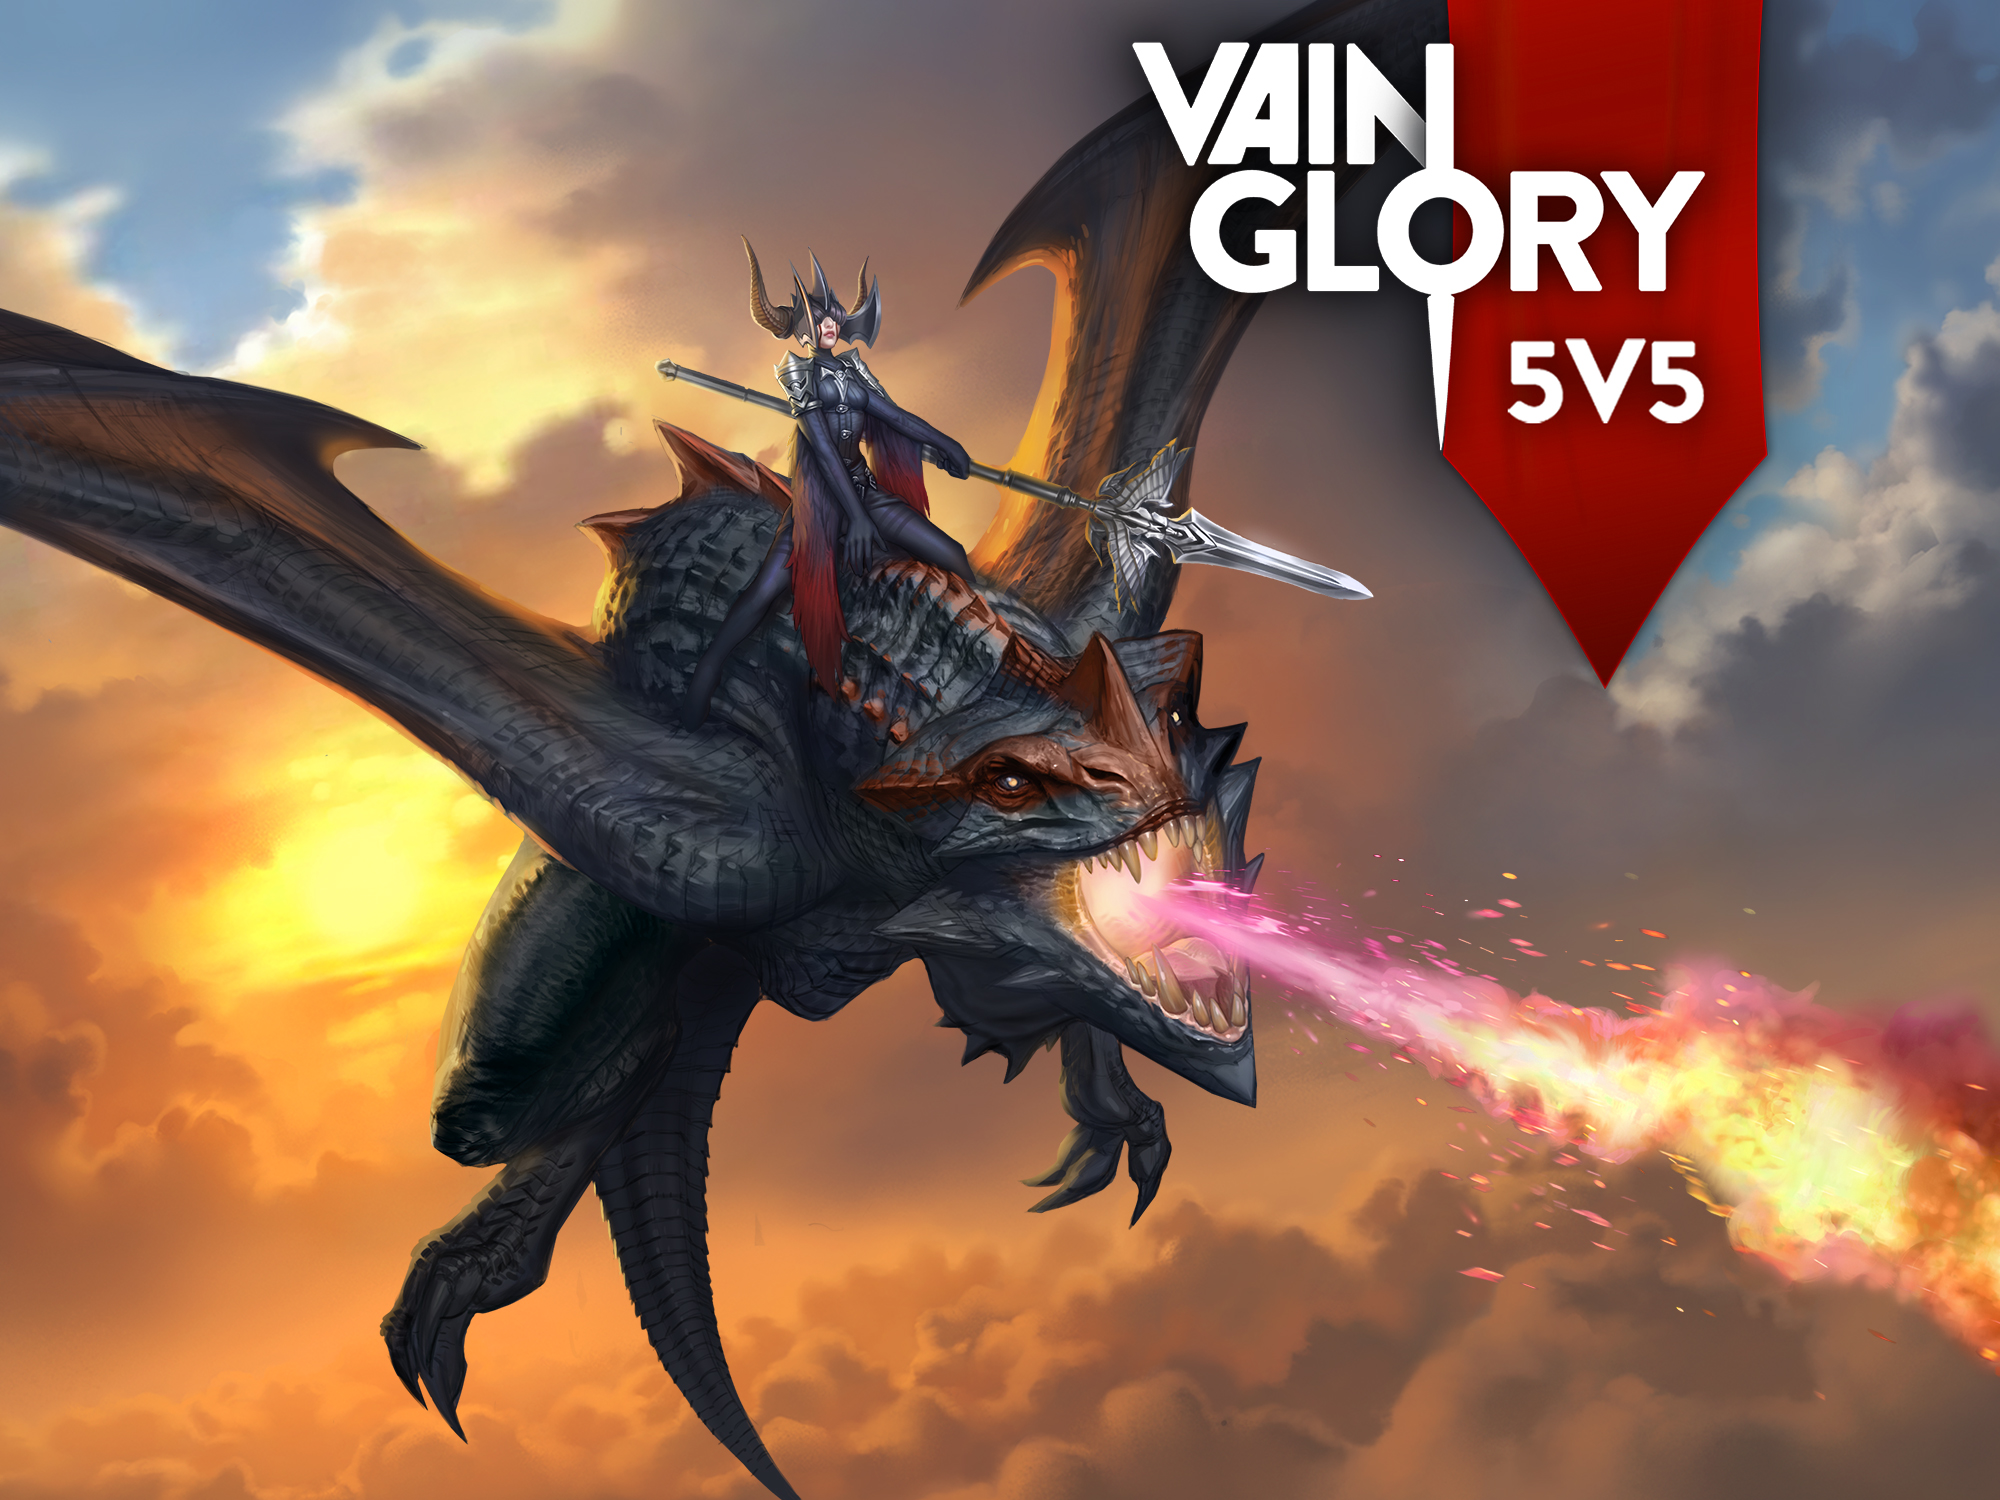 Vainglory-5V5.jpg